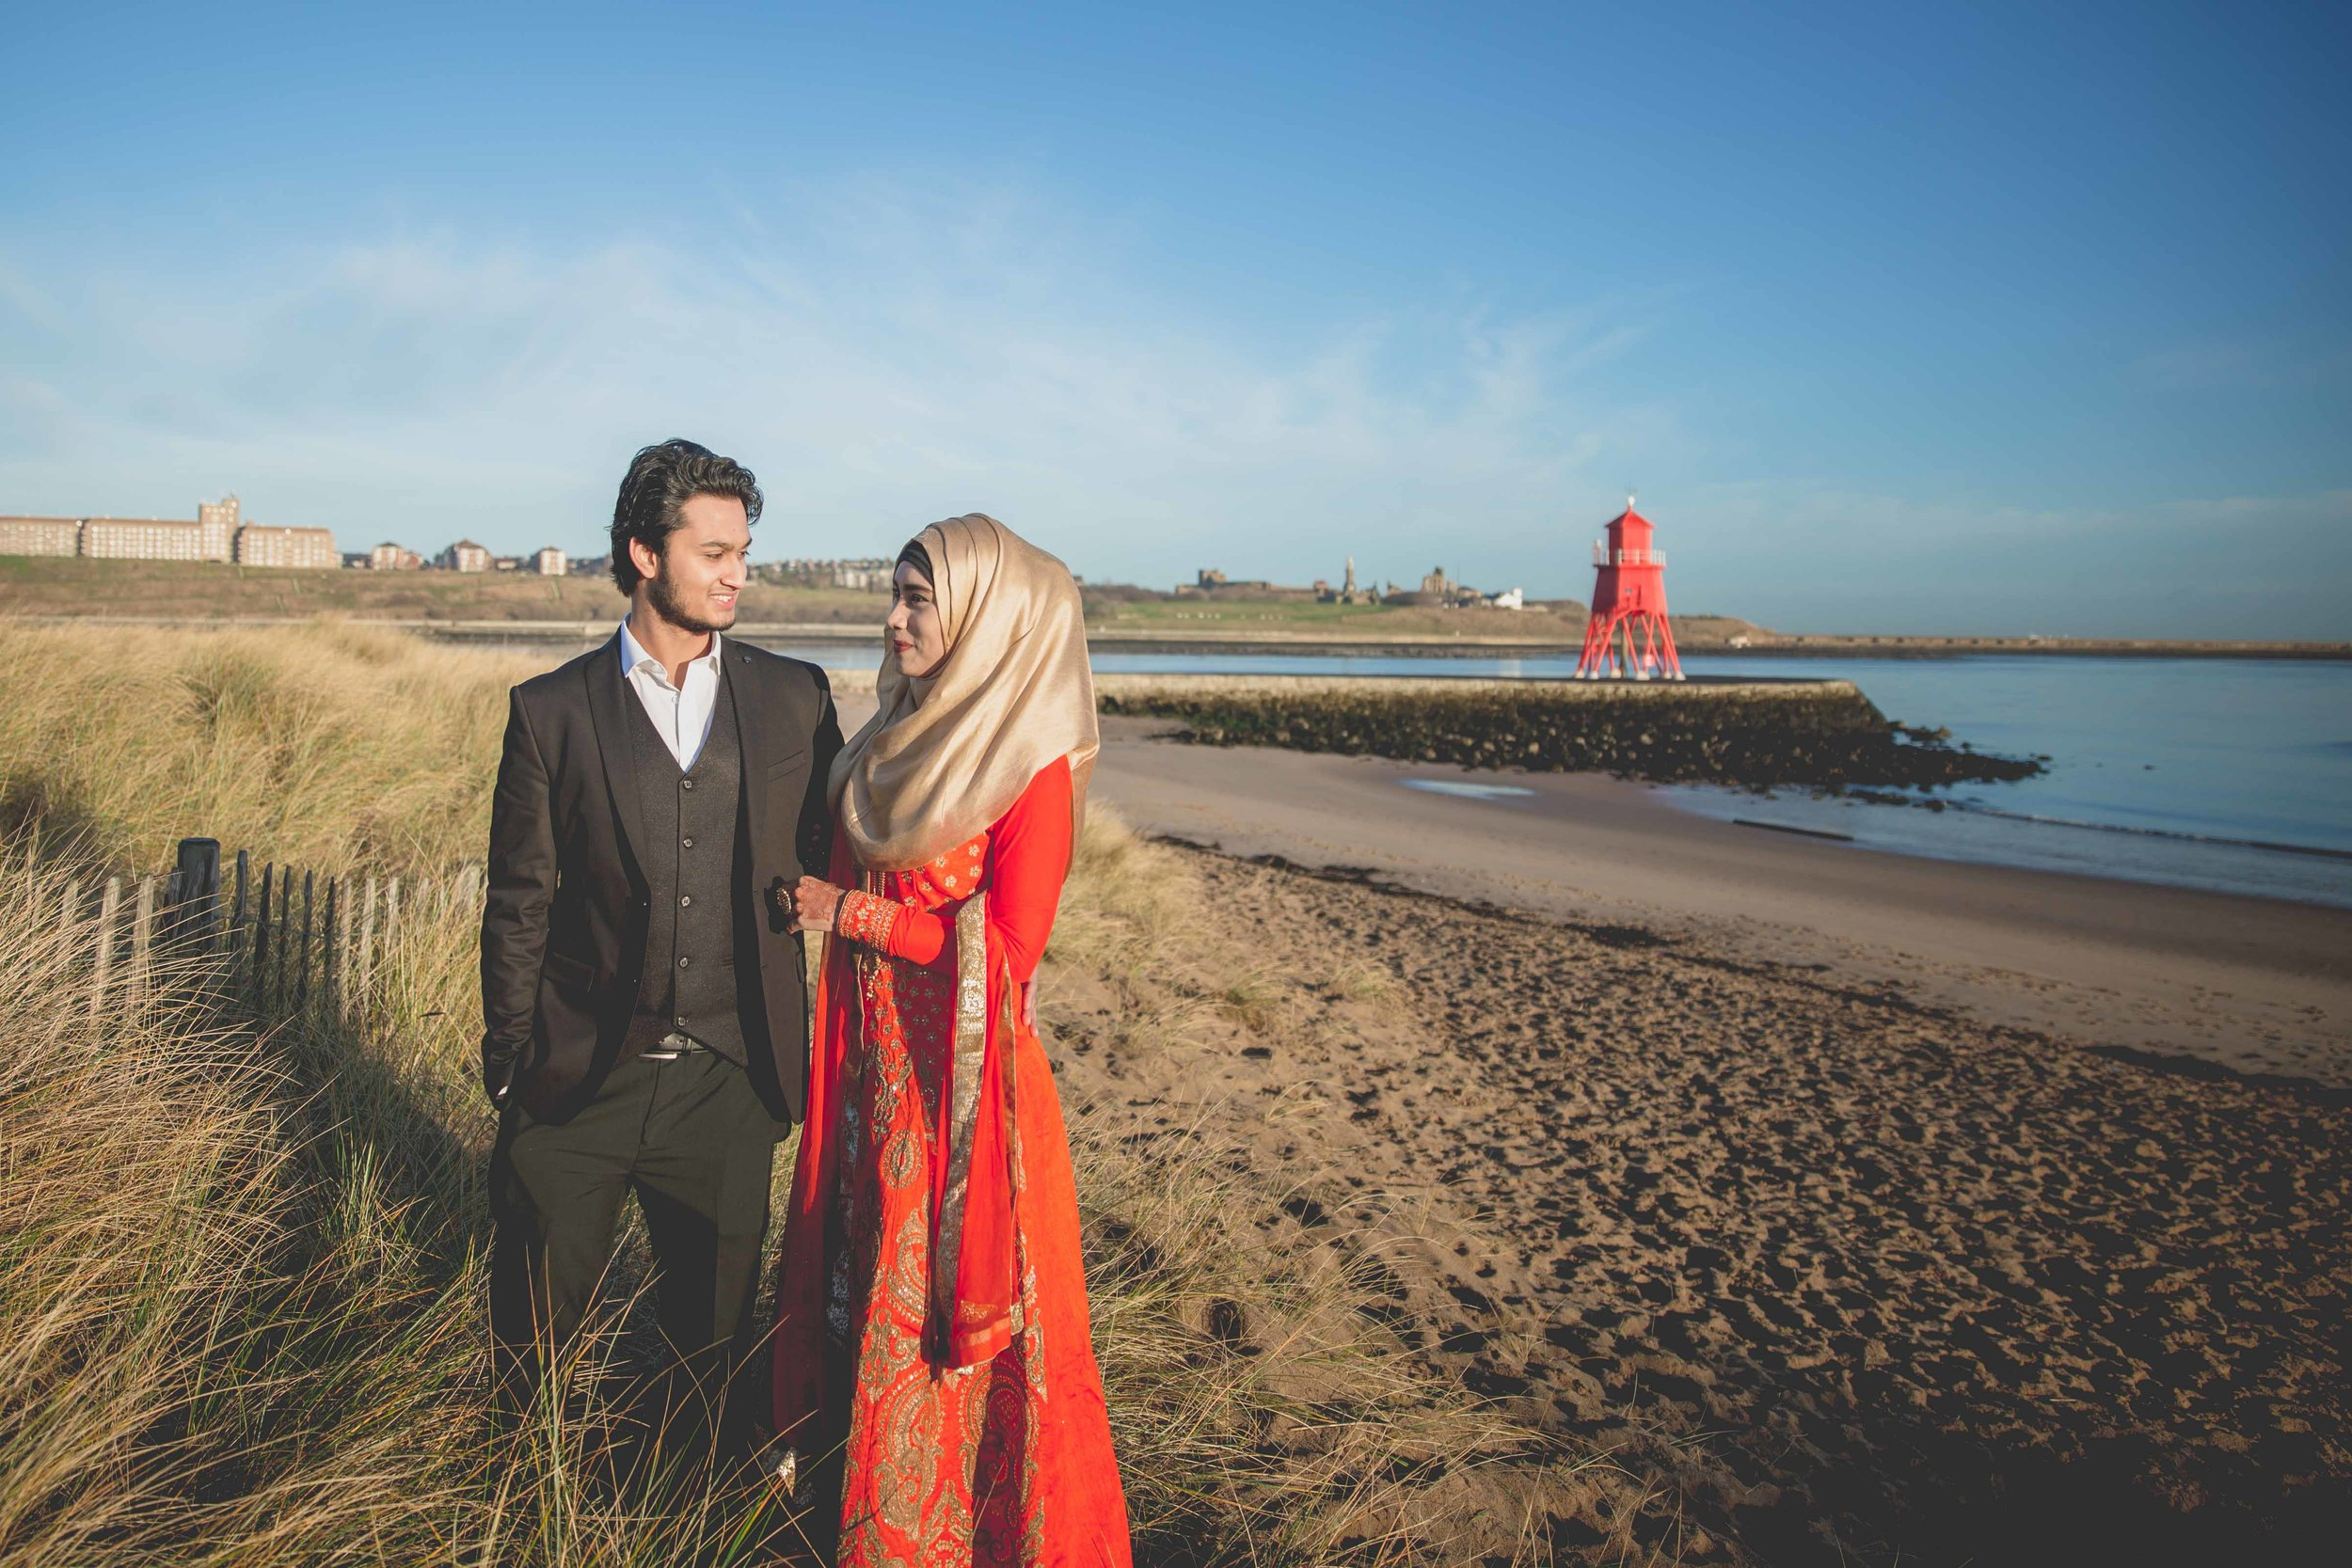 newcastle-beach-lighthouse-couple-prewedding-pre-wedding-shoot-asian-wedding-photographer-natalia-smith-photography-7.jpg